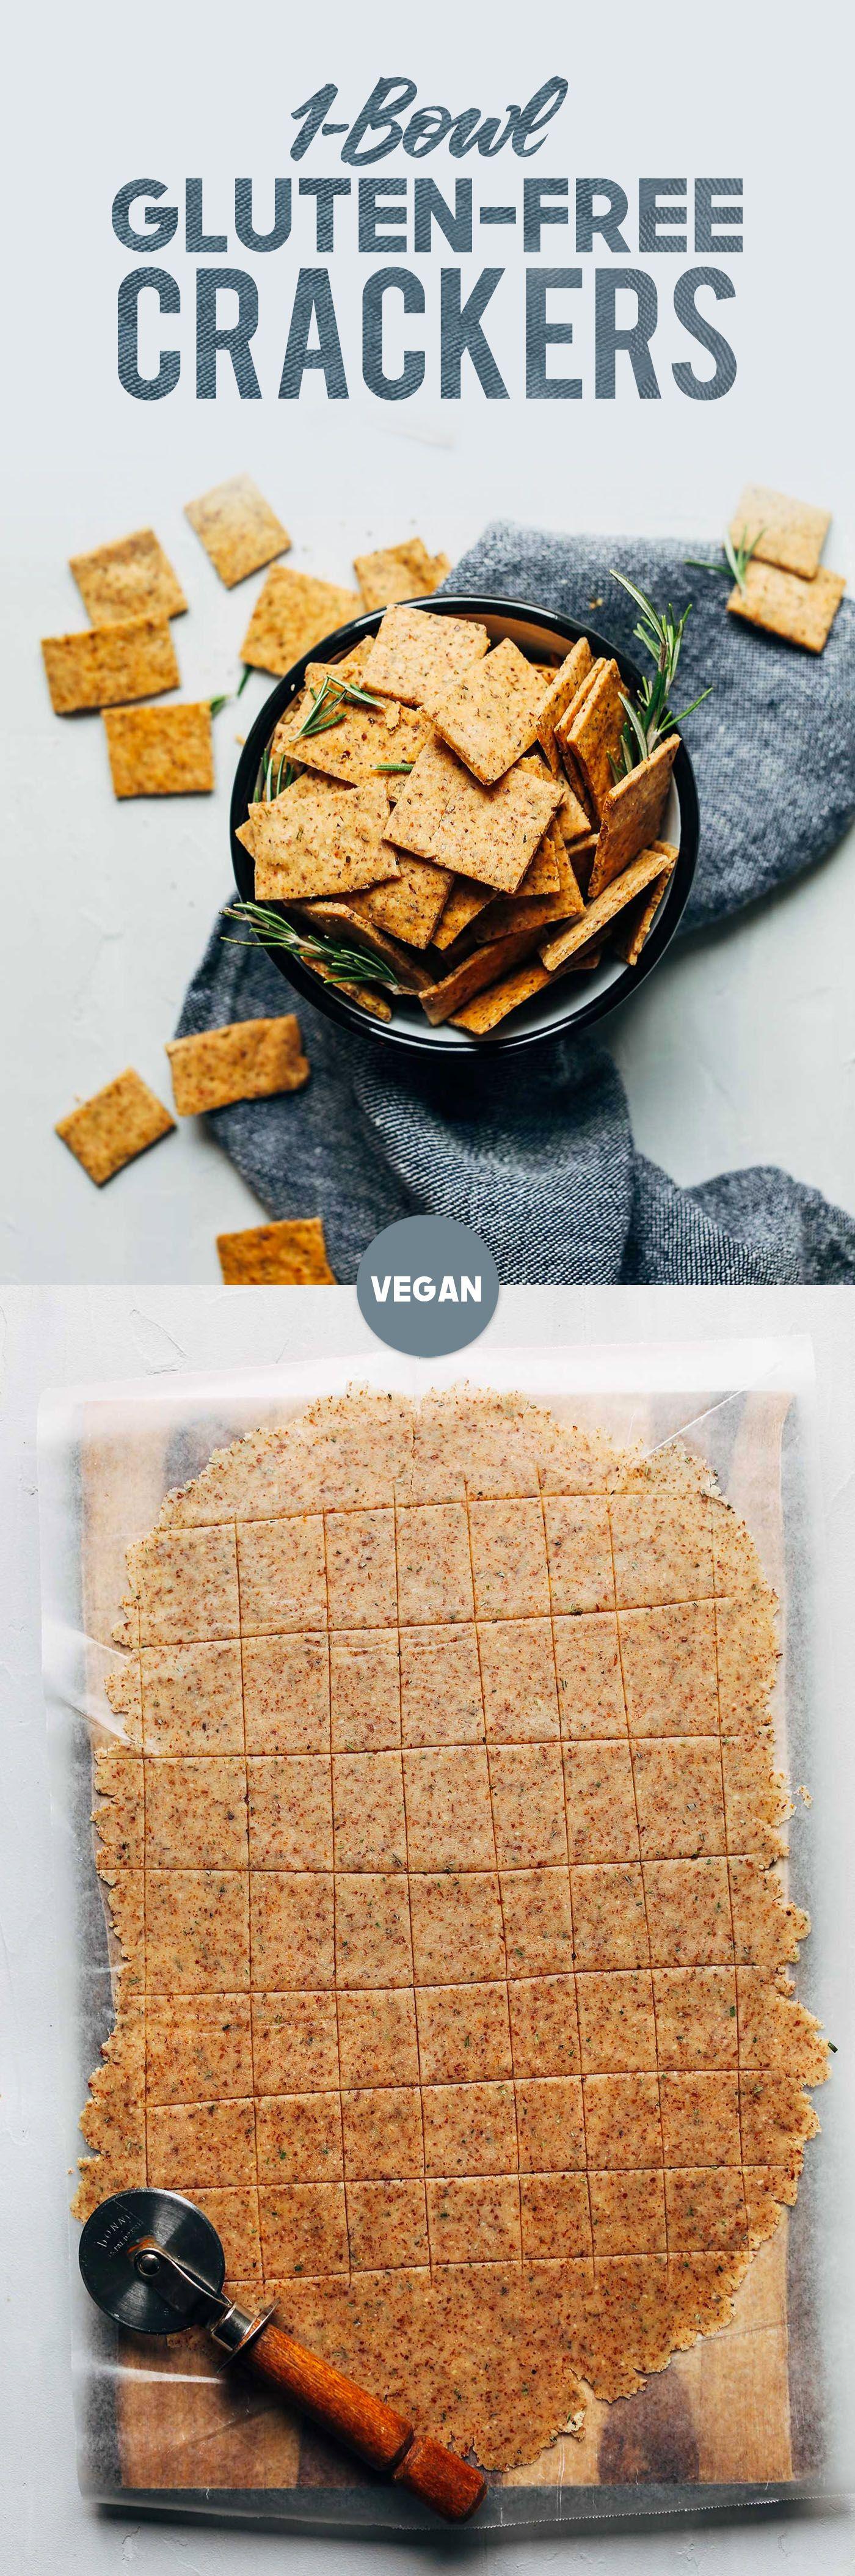 1 Bowl Vegan Gluten Free Crackers Recipe Gluten Free Crackers